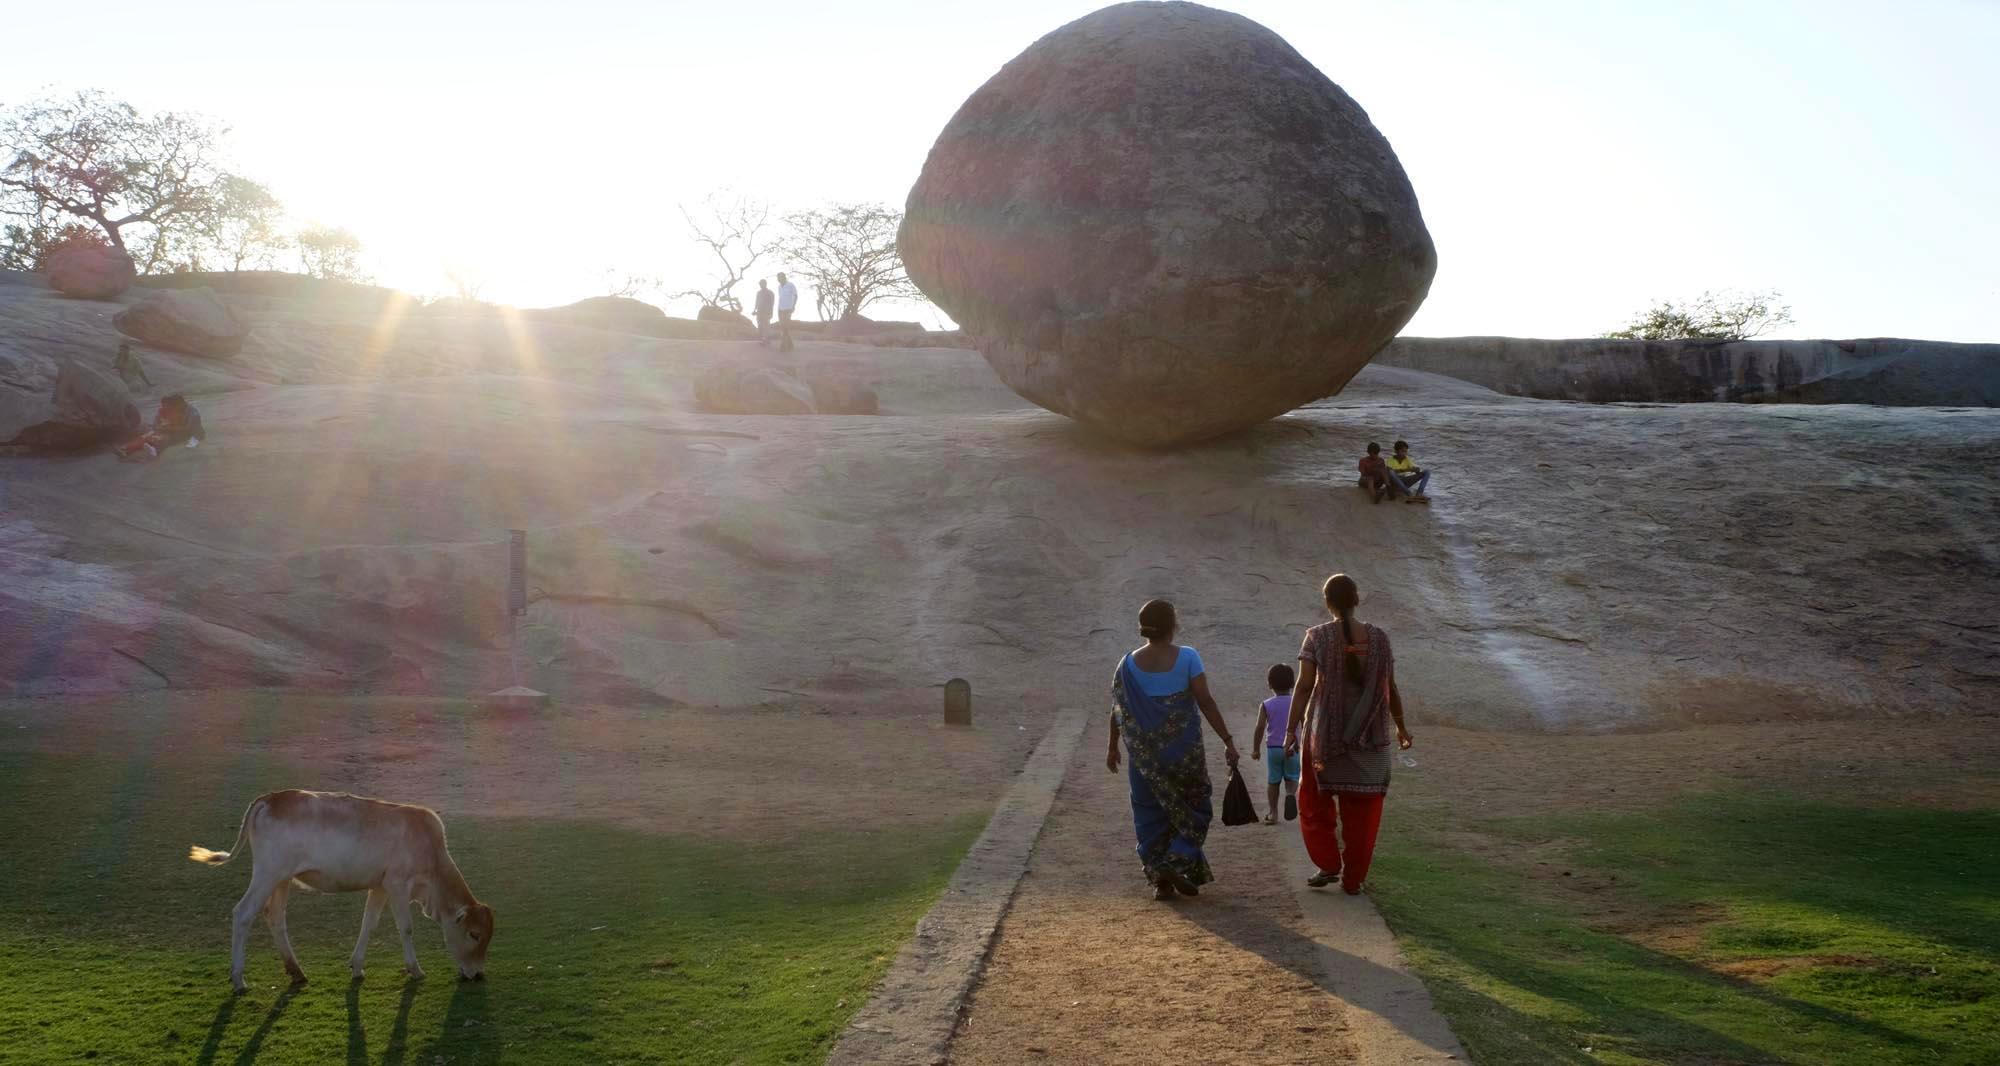 reise-ansichten Tempel Mamallapuram